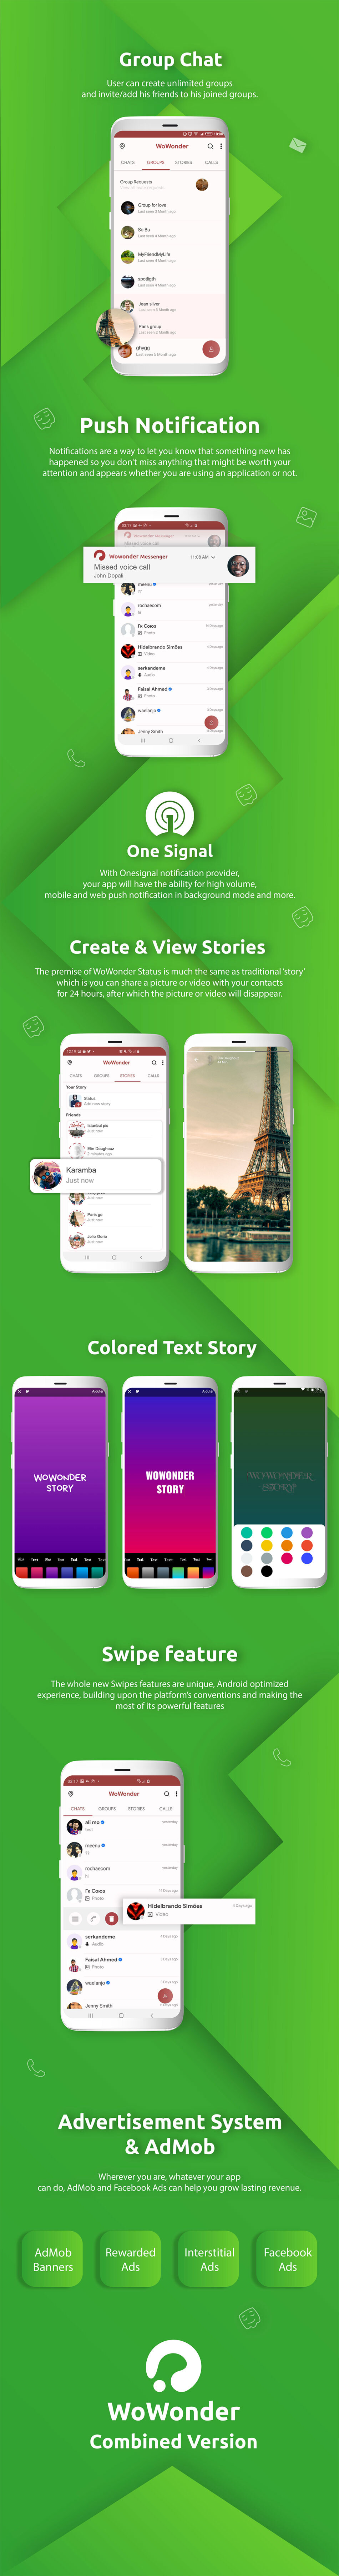 WoWonder Android Messenger - Mobile Application for WoWonder Social Script - 4